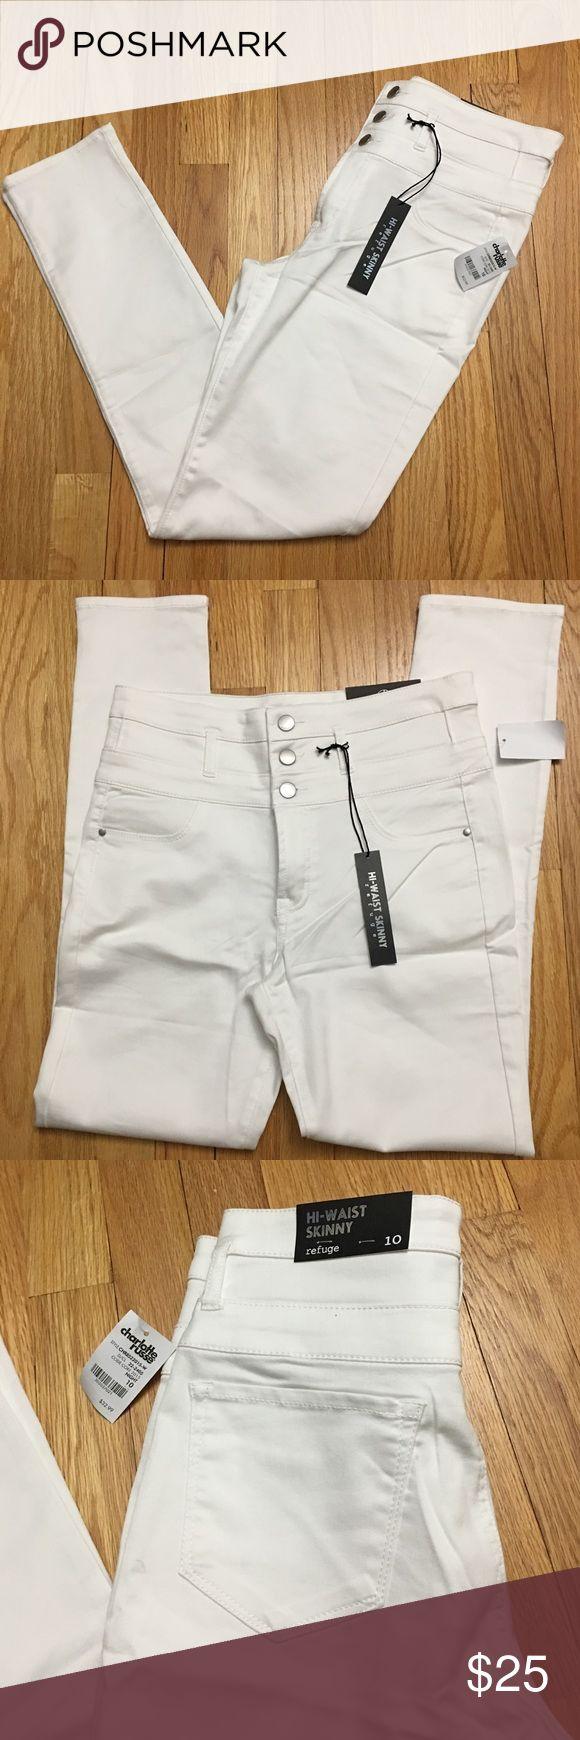 High Waisted White Skinny Jeans Charlotte Russe 10 NWT high waisted skinny jeans, Size 10 Charlotte Russe Jeans Skinny